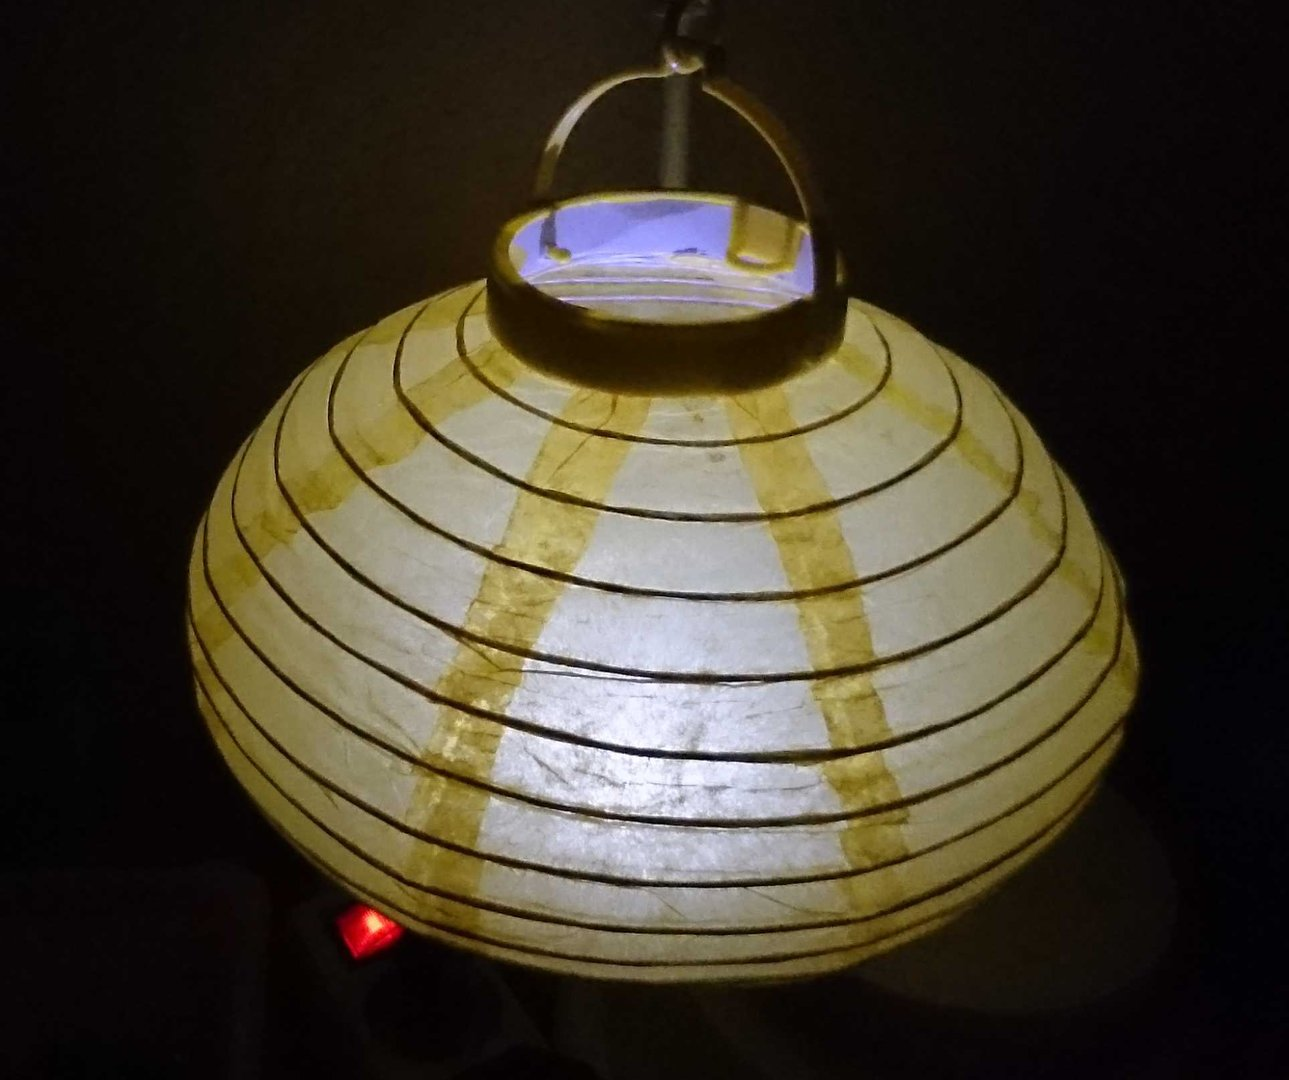 led lampion laterne 20 cm durchmesser mit batterie an aus schalte. Black Bedroom Furniture Sets. Home Design Ideas